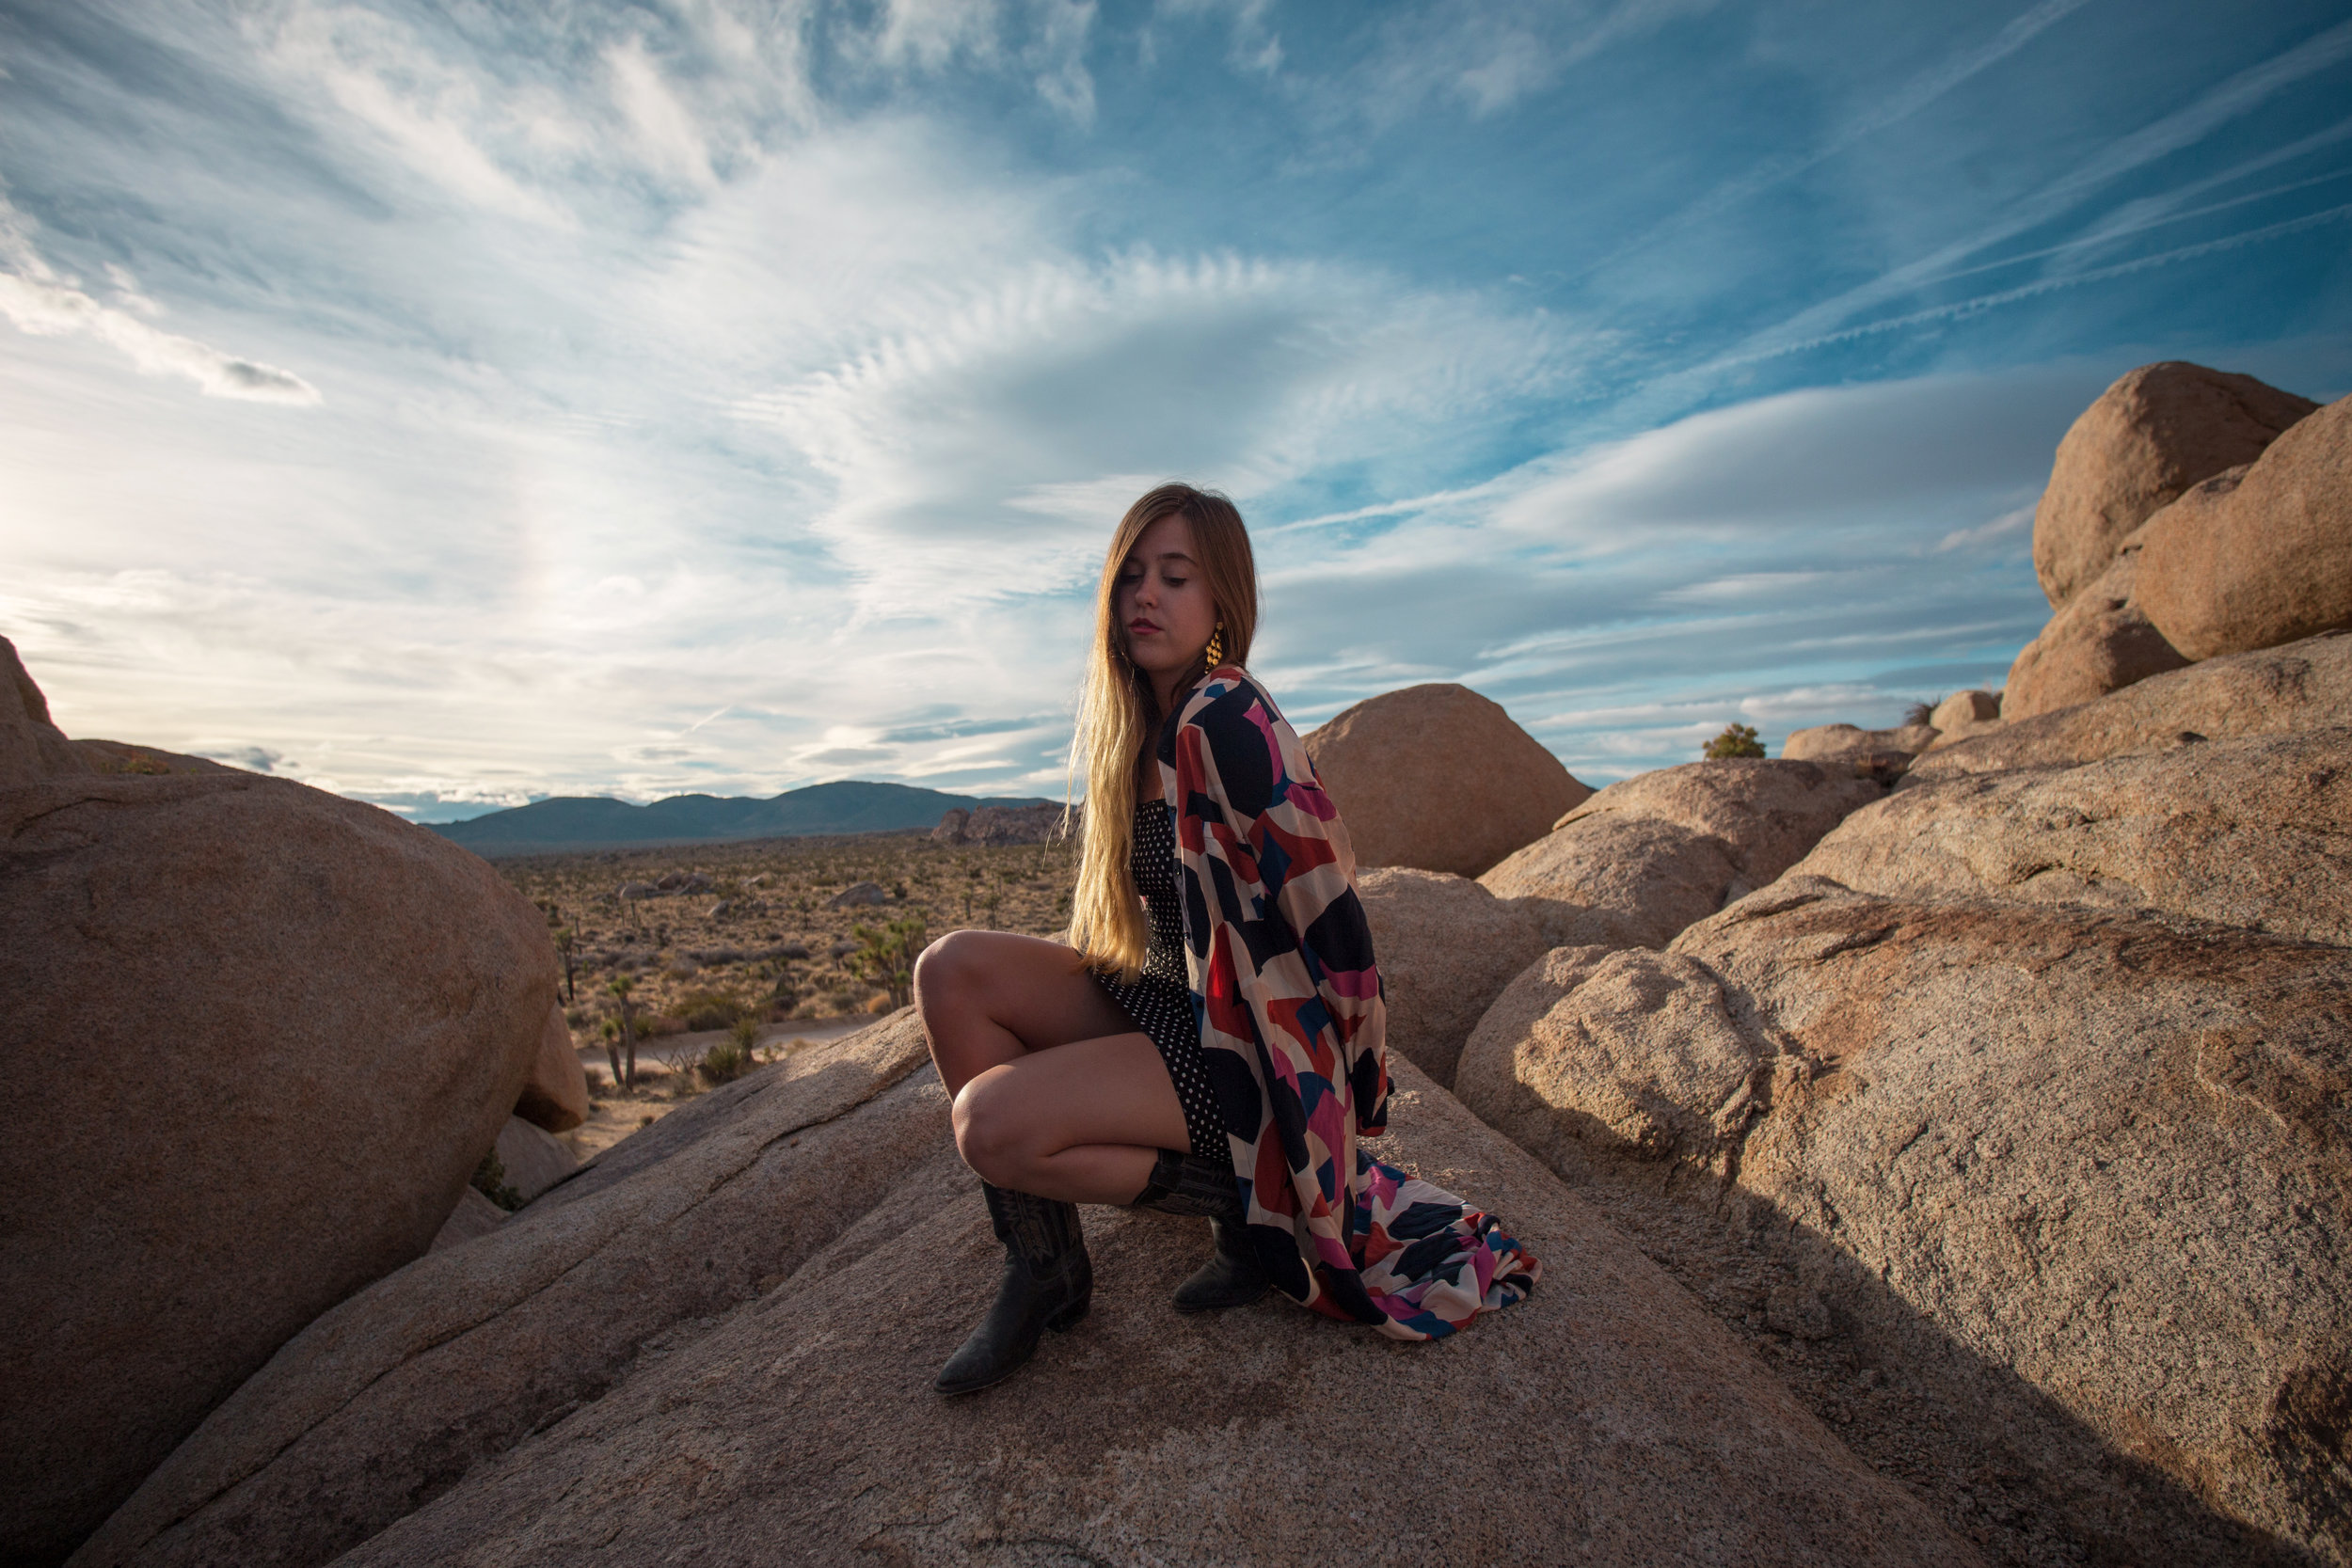 AstroBandit_JordanRose_GoJane_FreePeople_CowboyBoots_FarylRobin_Desert_Sunset_Spring_2018_MixingPrints_2.jpg